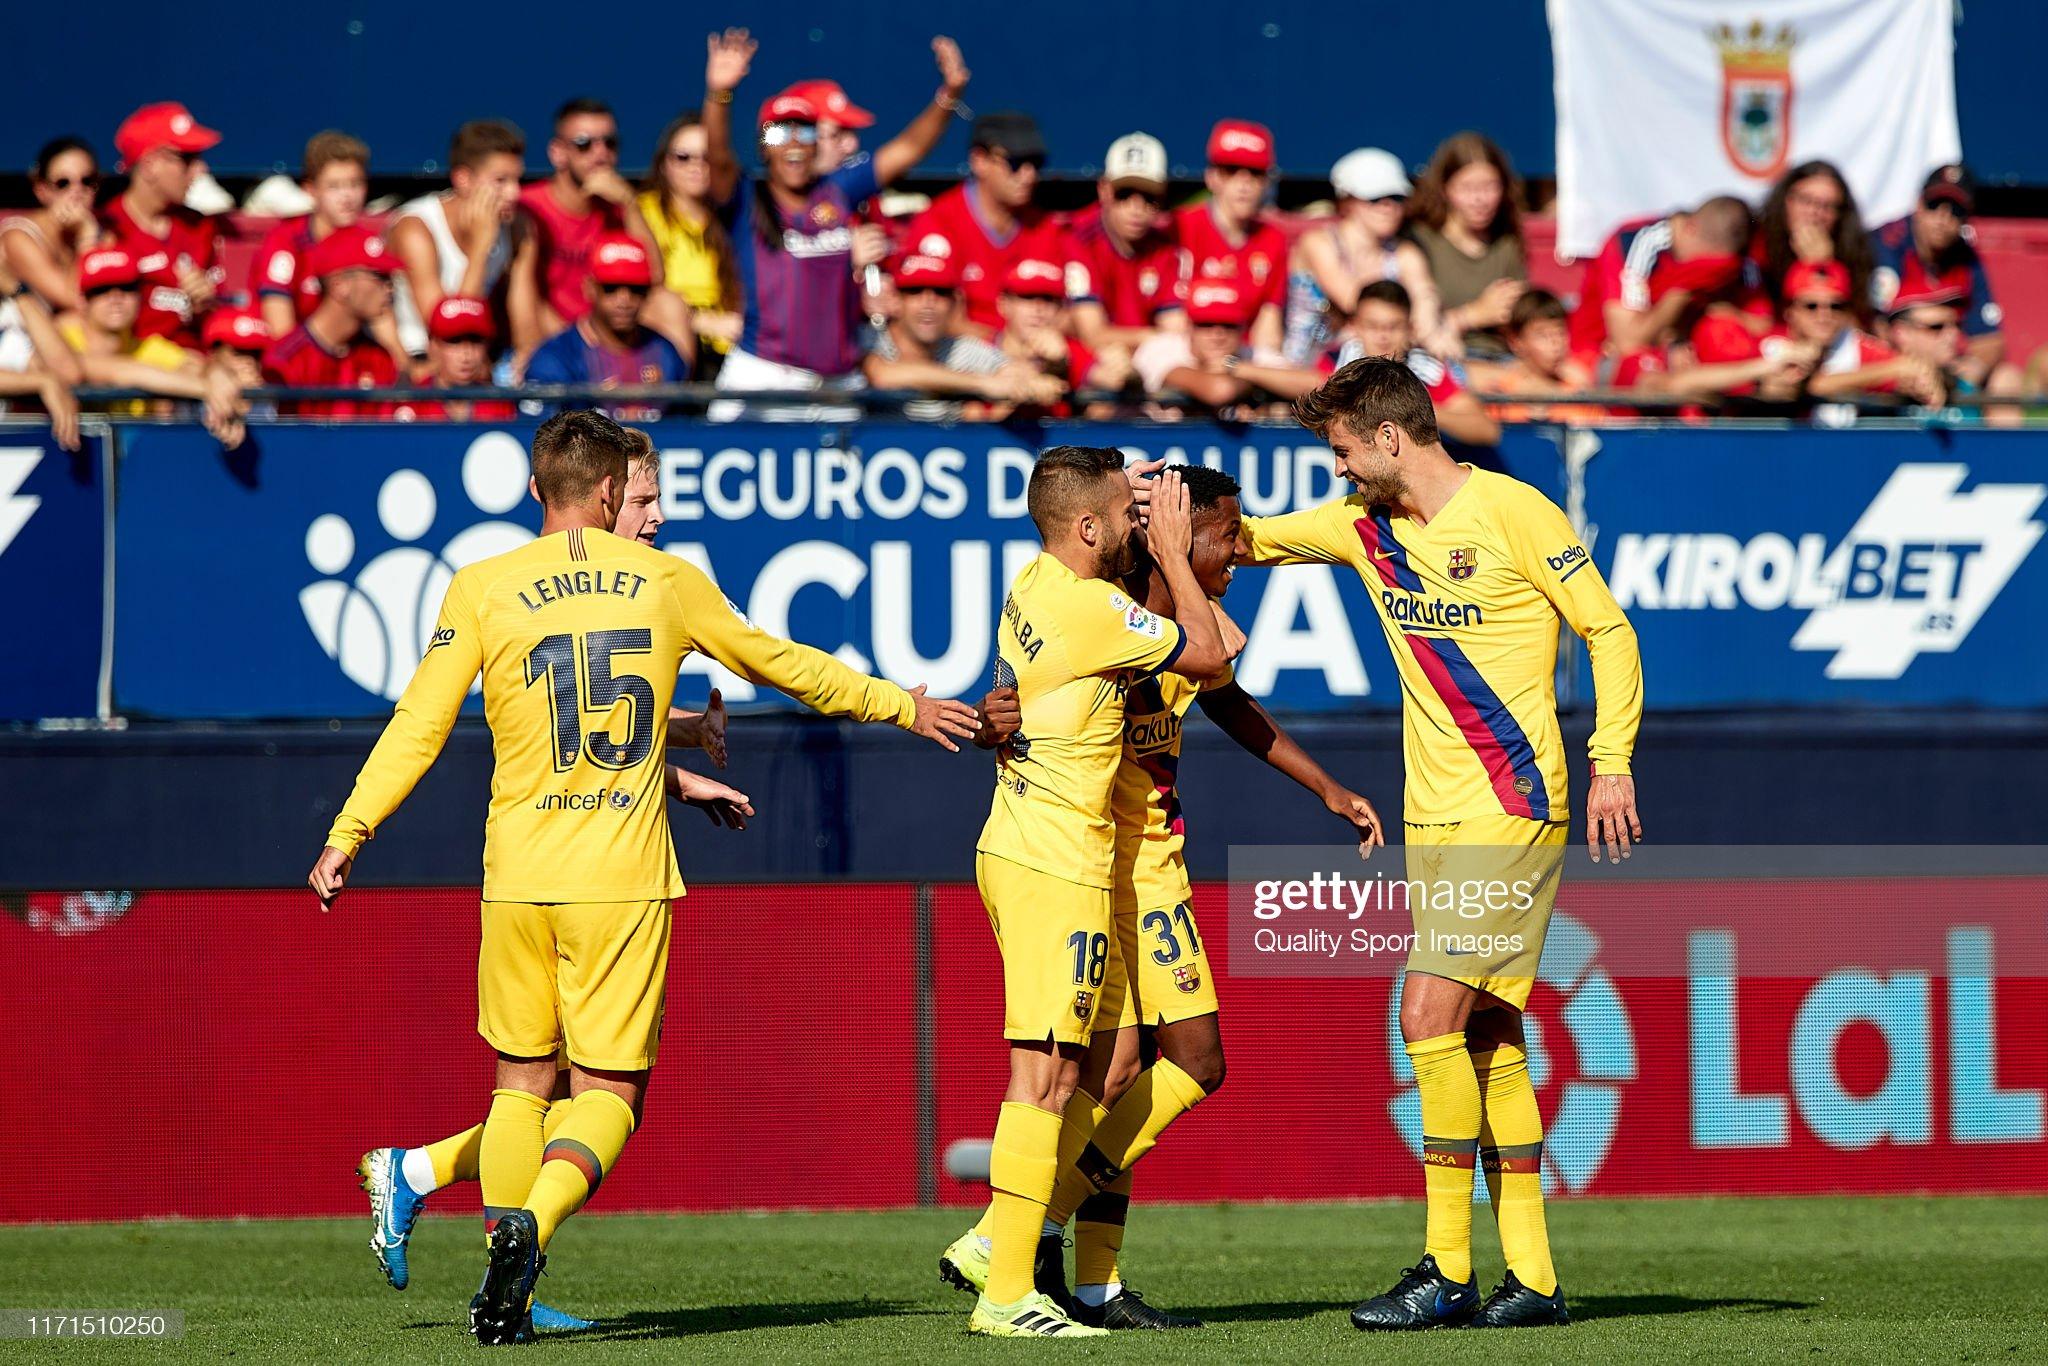 صور مباراة : أوساسونا - برشلونة 2-2 ( 31-08-2019 )  Players-of-fc-barcelona-celebrating-their-teams-first-goal-during-the-picture-id1171510250?s=2048x2048